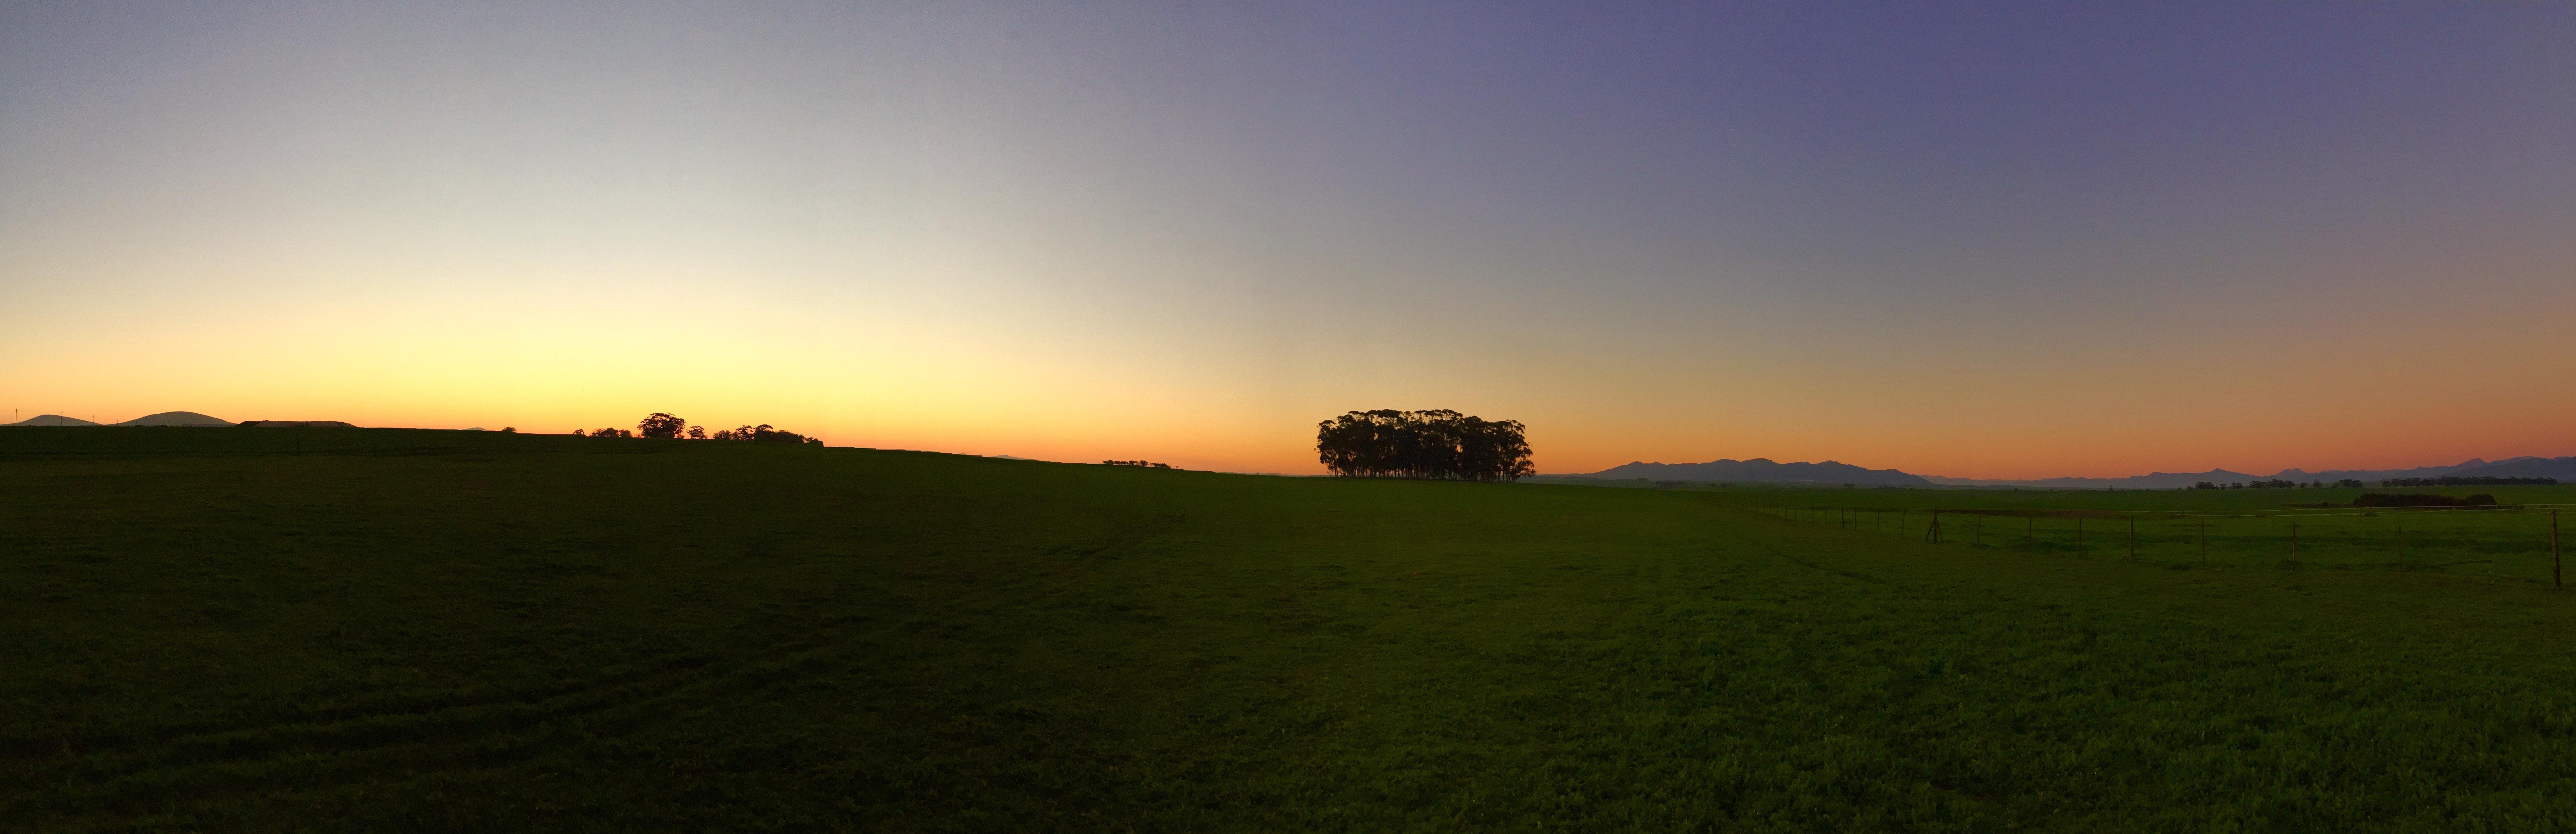 grass field sunrise. Exellent Sunrise More  Sunrise On Green Grass Field With E